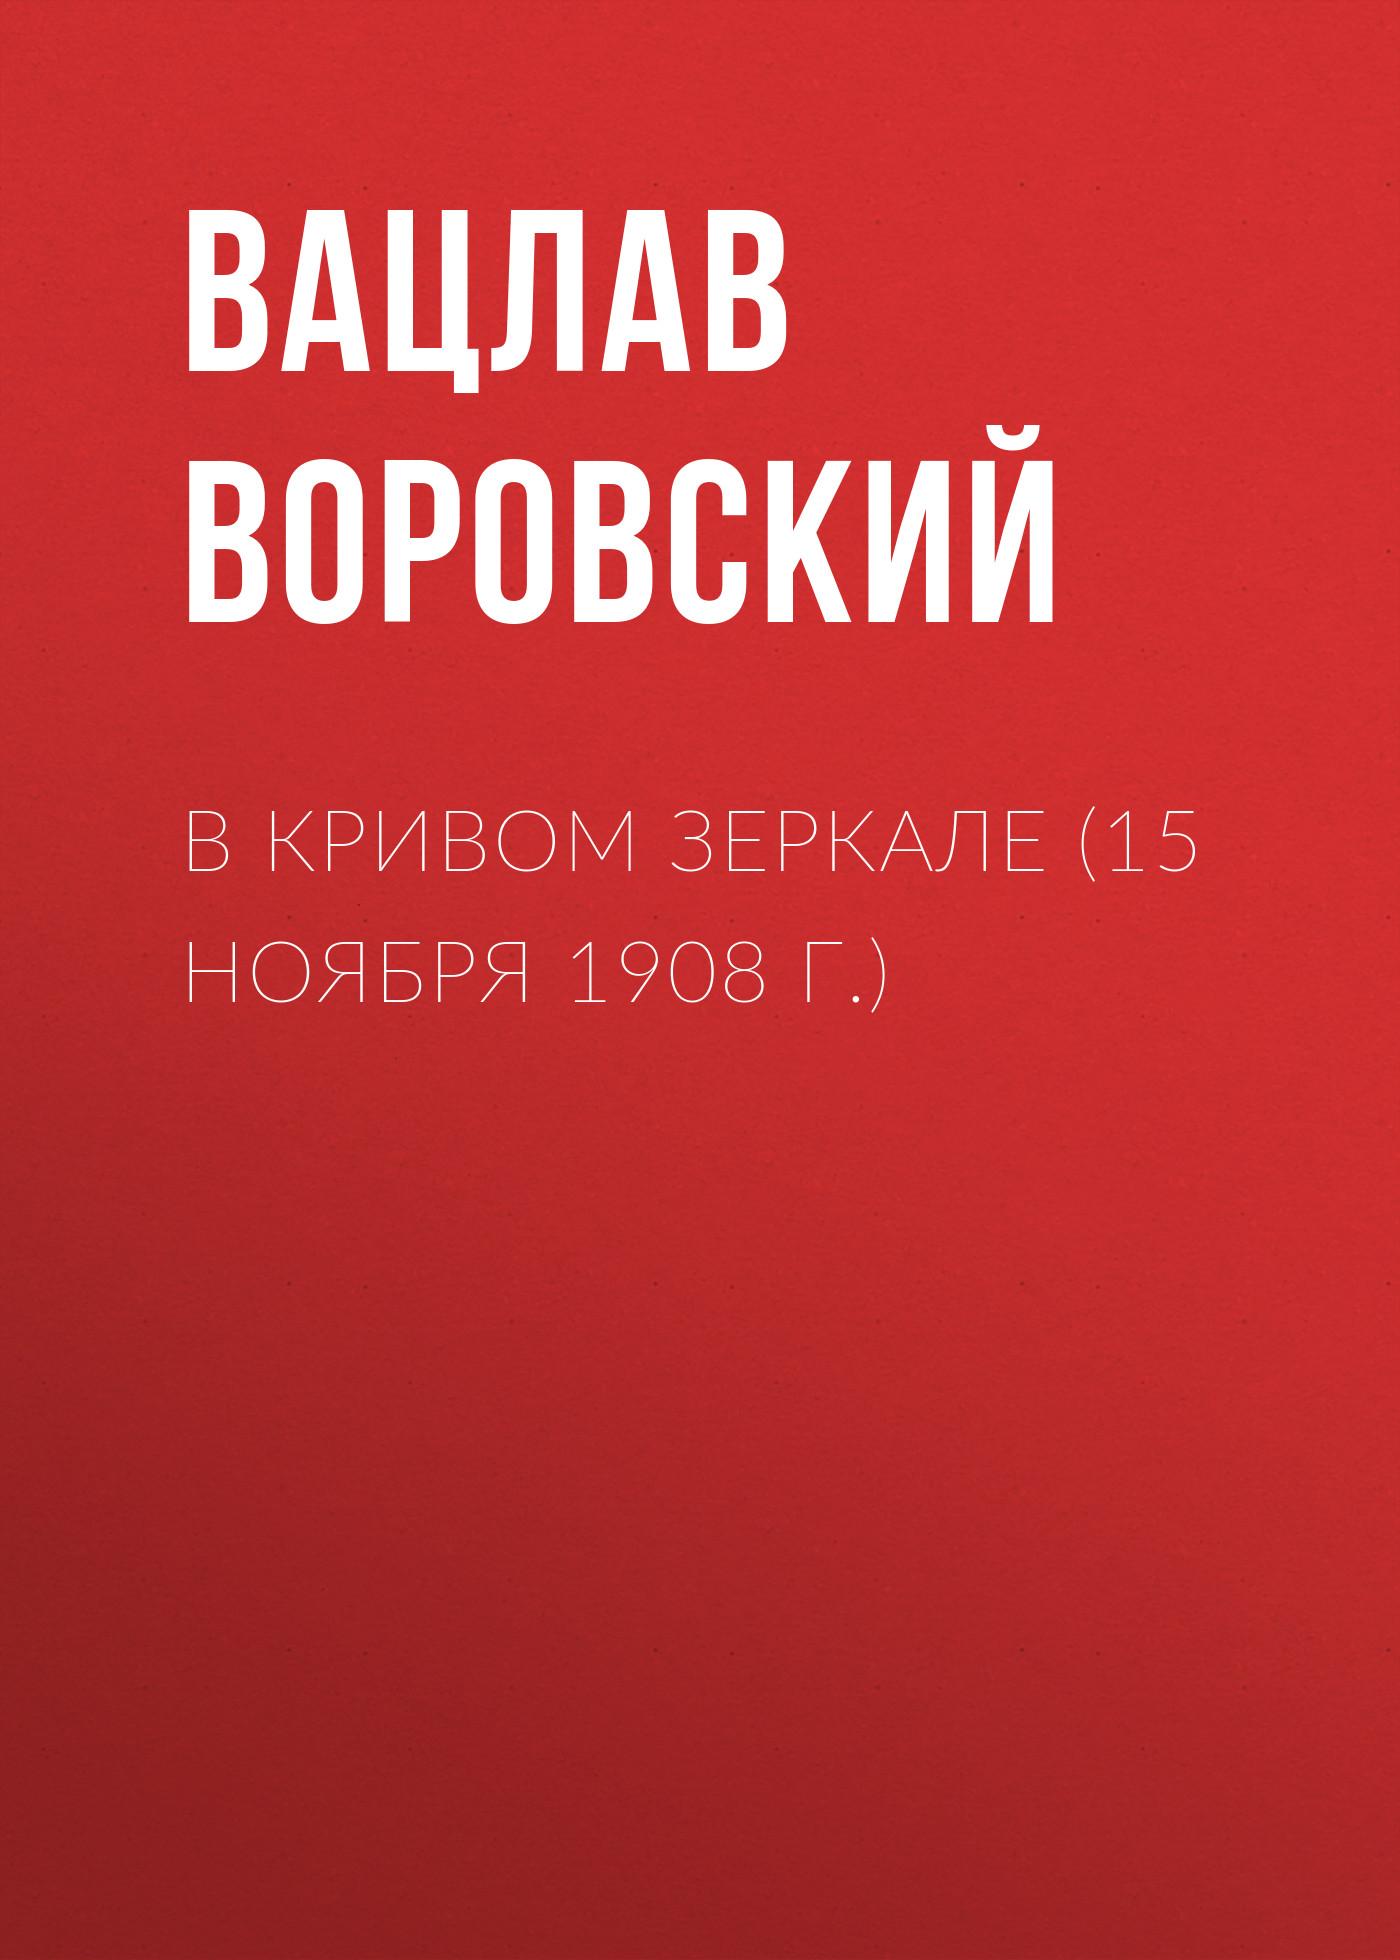 Вацлав Воровский В кривом зеркале (15 ноября 1908 г.) вацлав воровский в кривом зеркале 10 декабря 1908 г